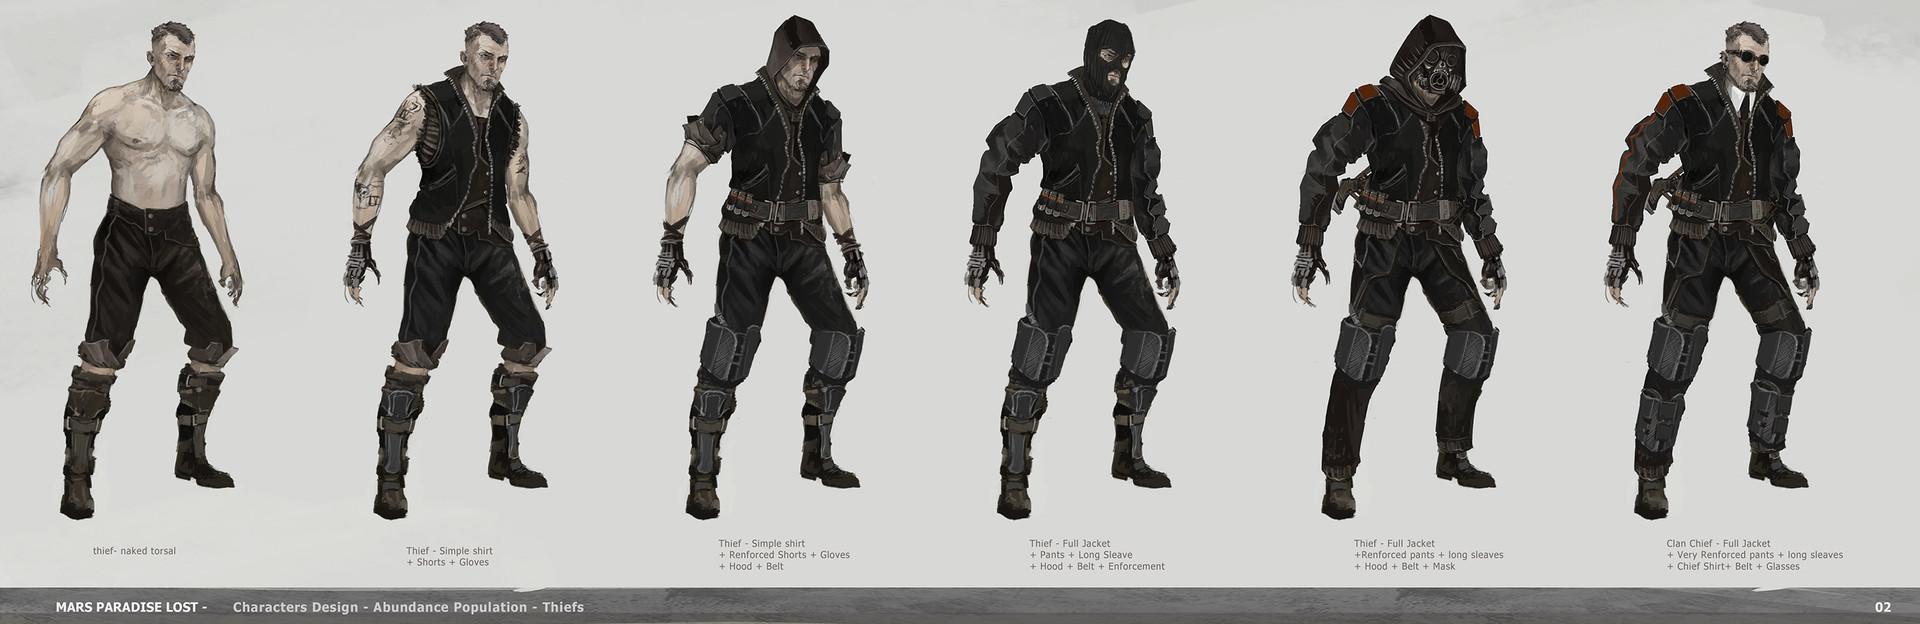 Alexandre chaudret mpl characters abondance population thief02